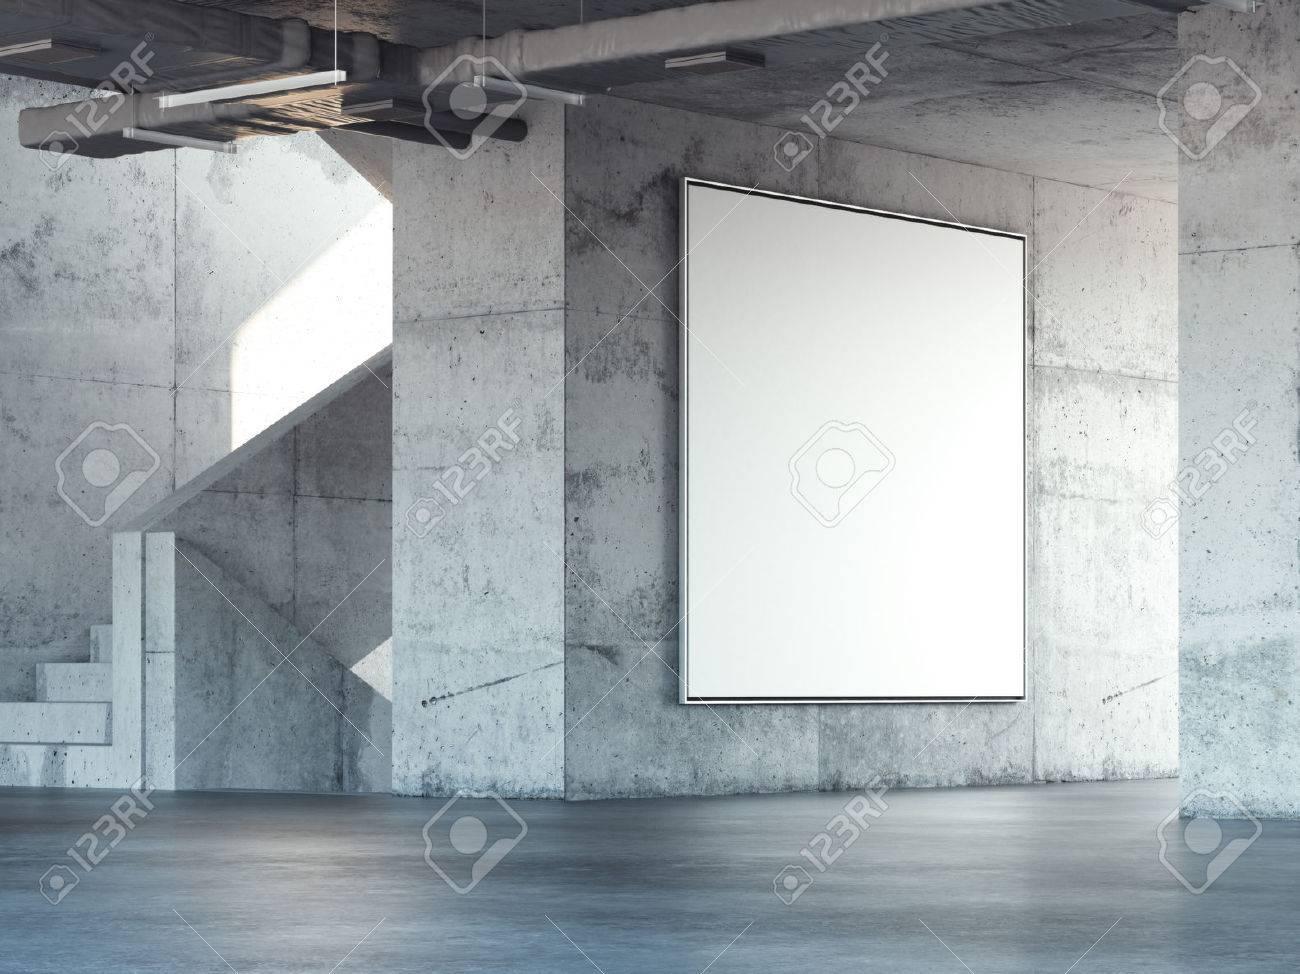 Concrete stairway with big blank square billboard. 3d rendering - 68193014